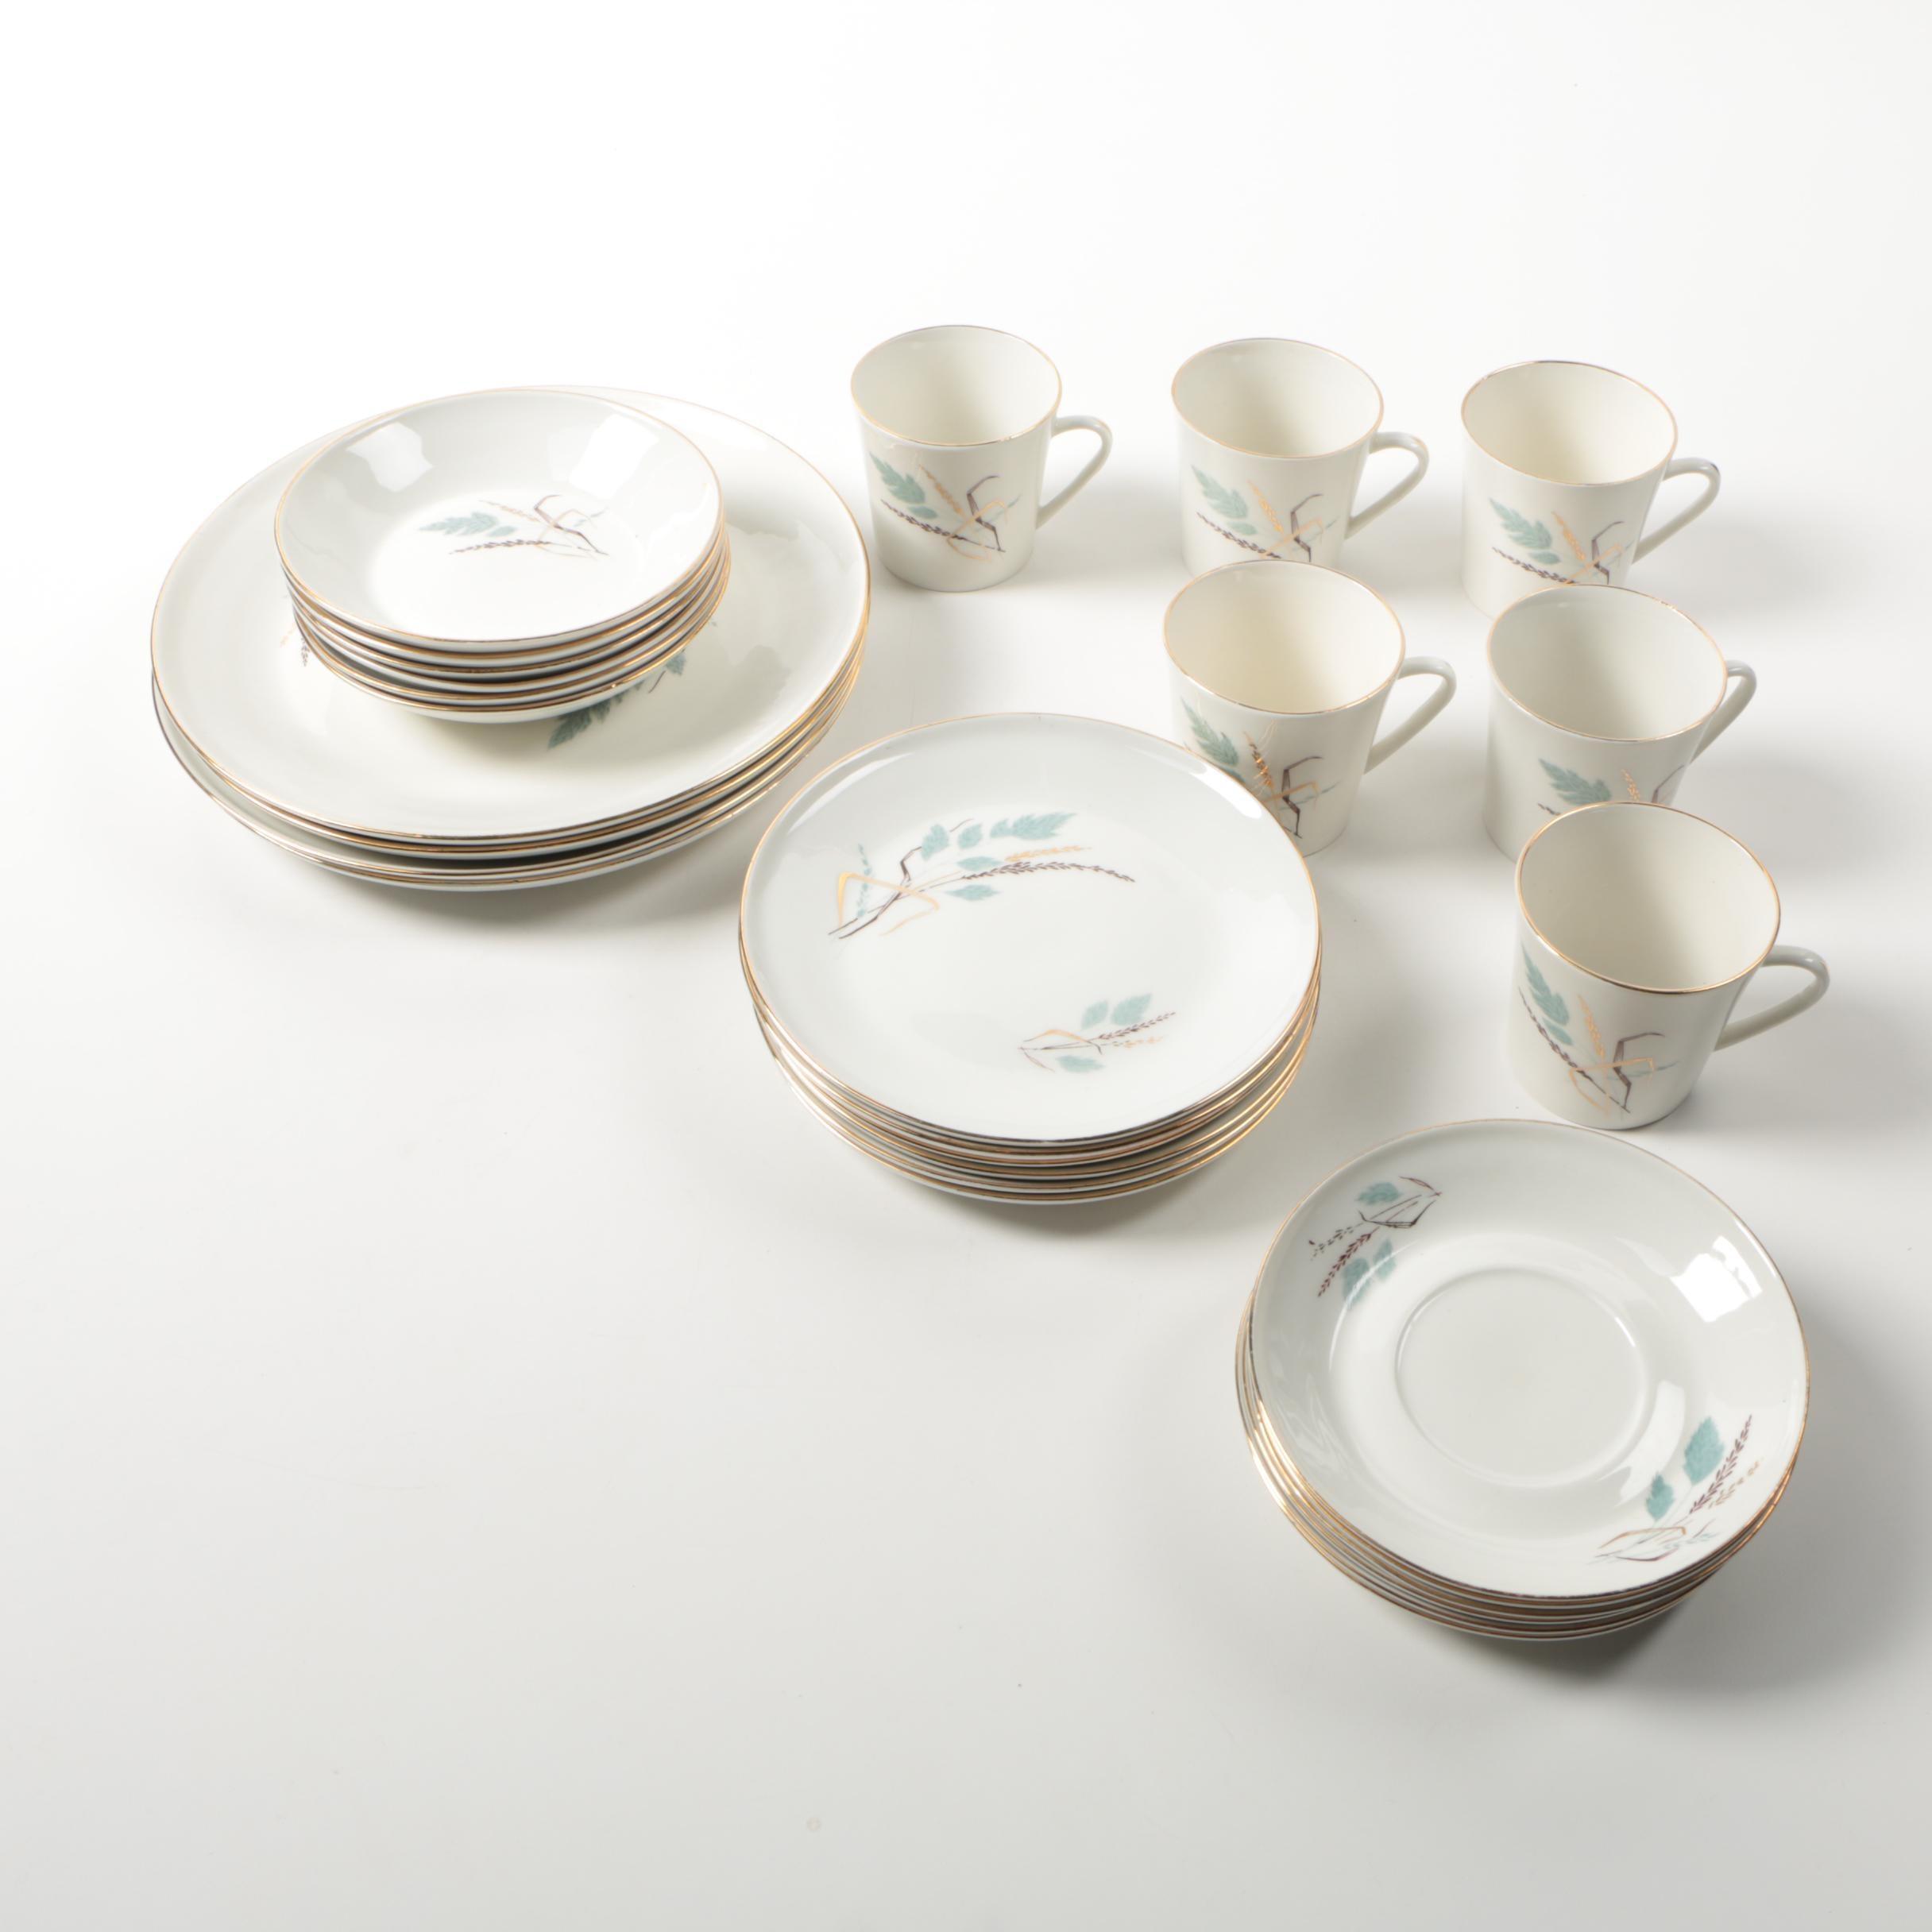 South African Ceramic Tableware